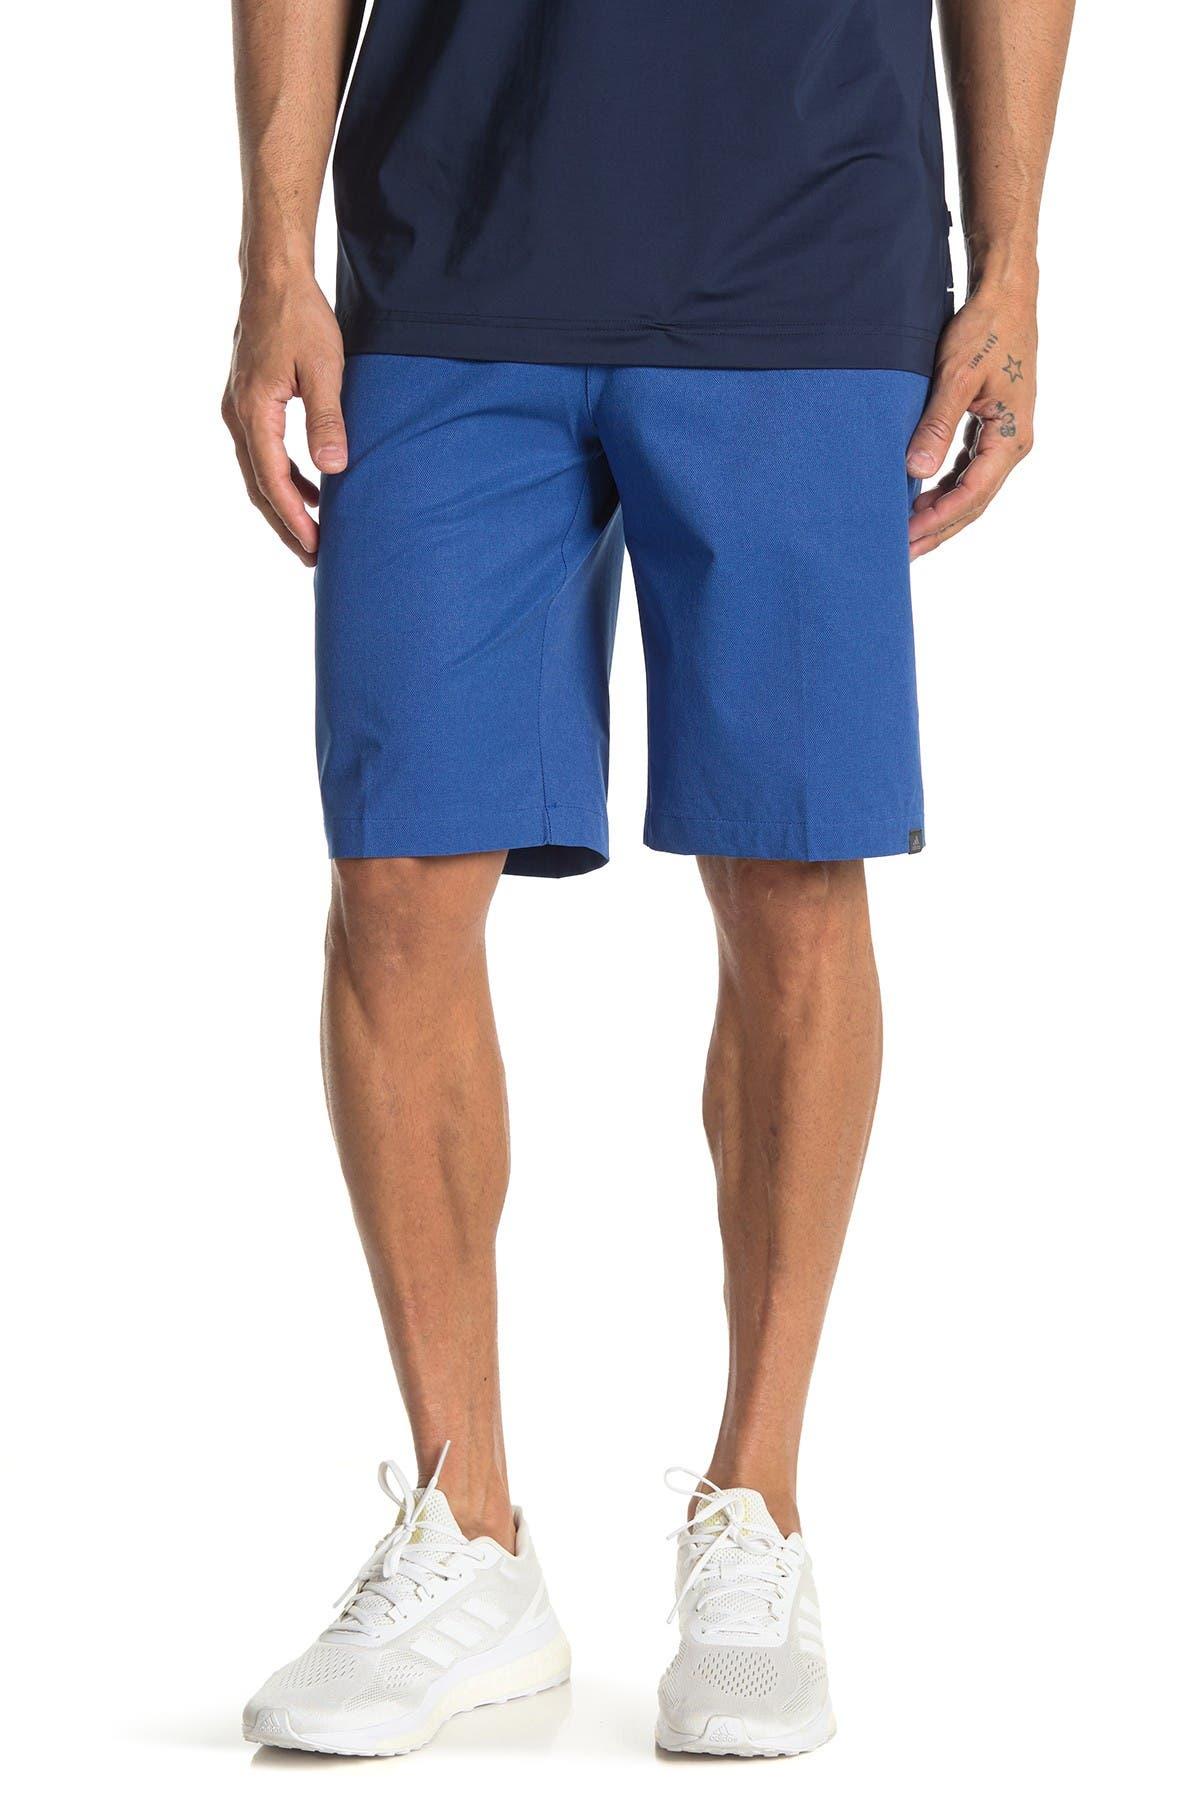 Image of Adidas Golf Ultimate365 Club Shorts